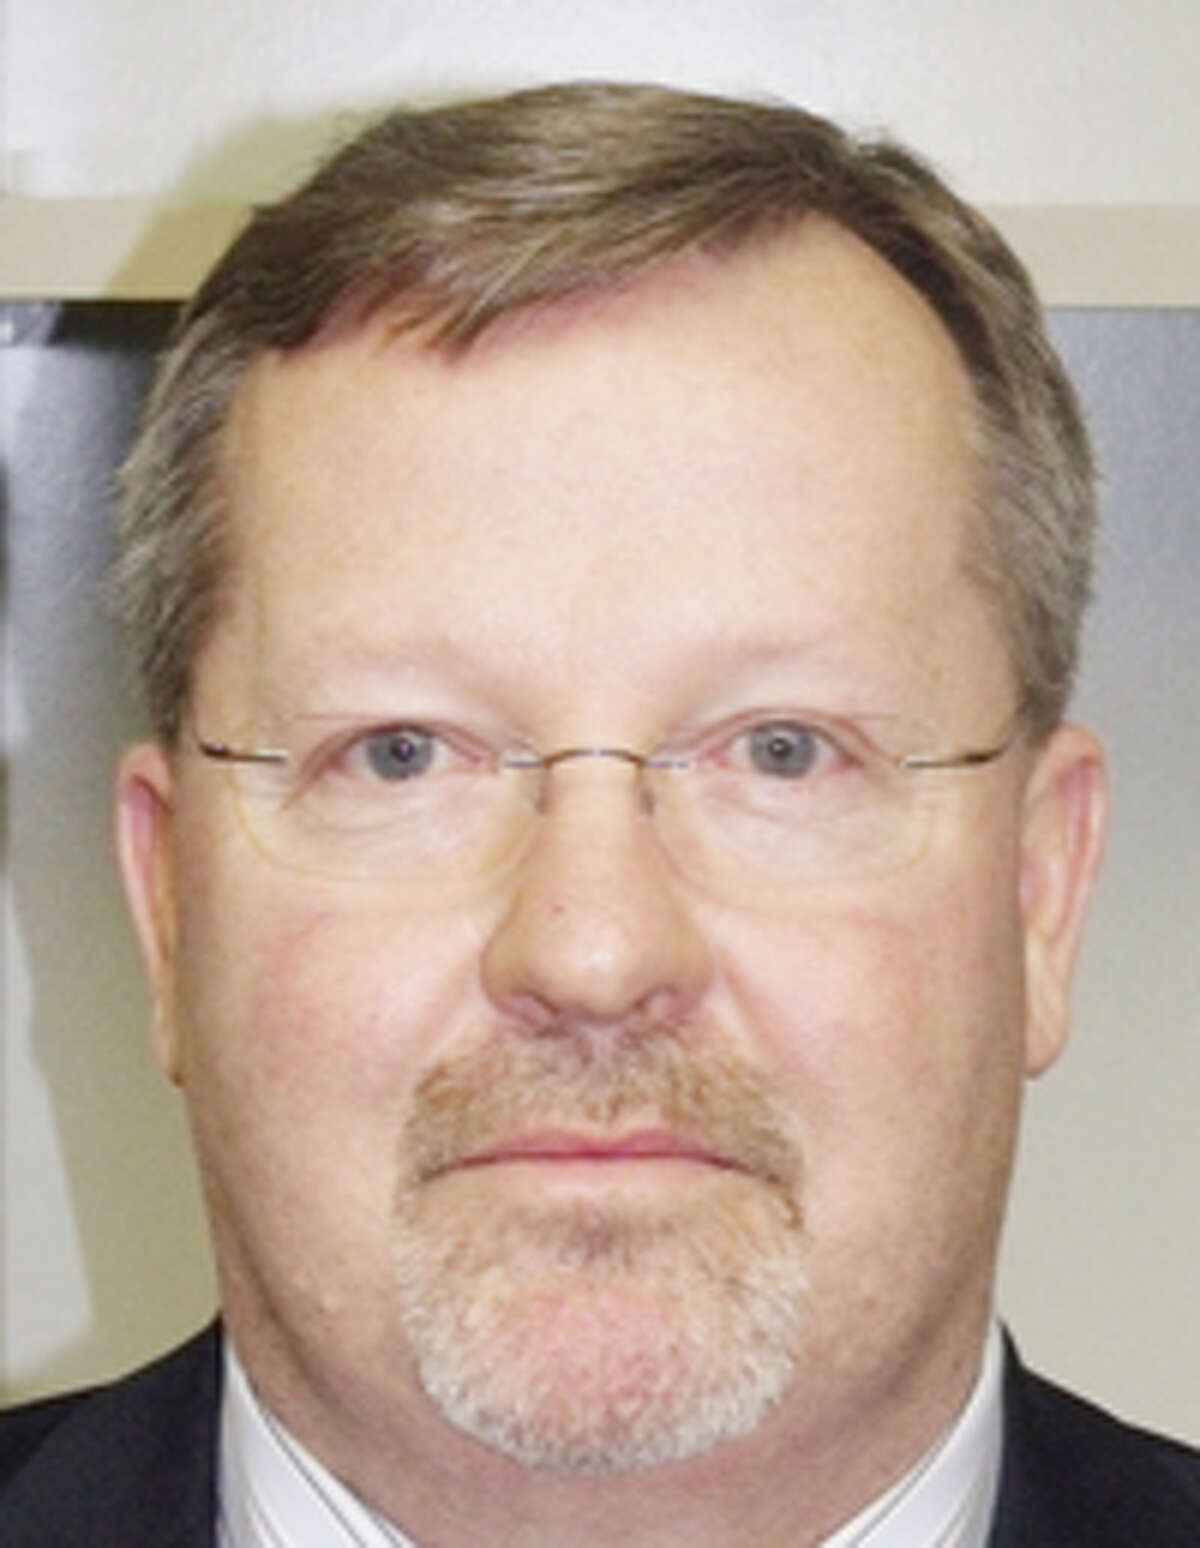 Superintendent Steven Westhoff